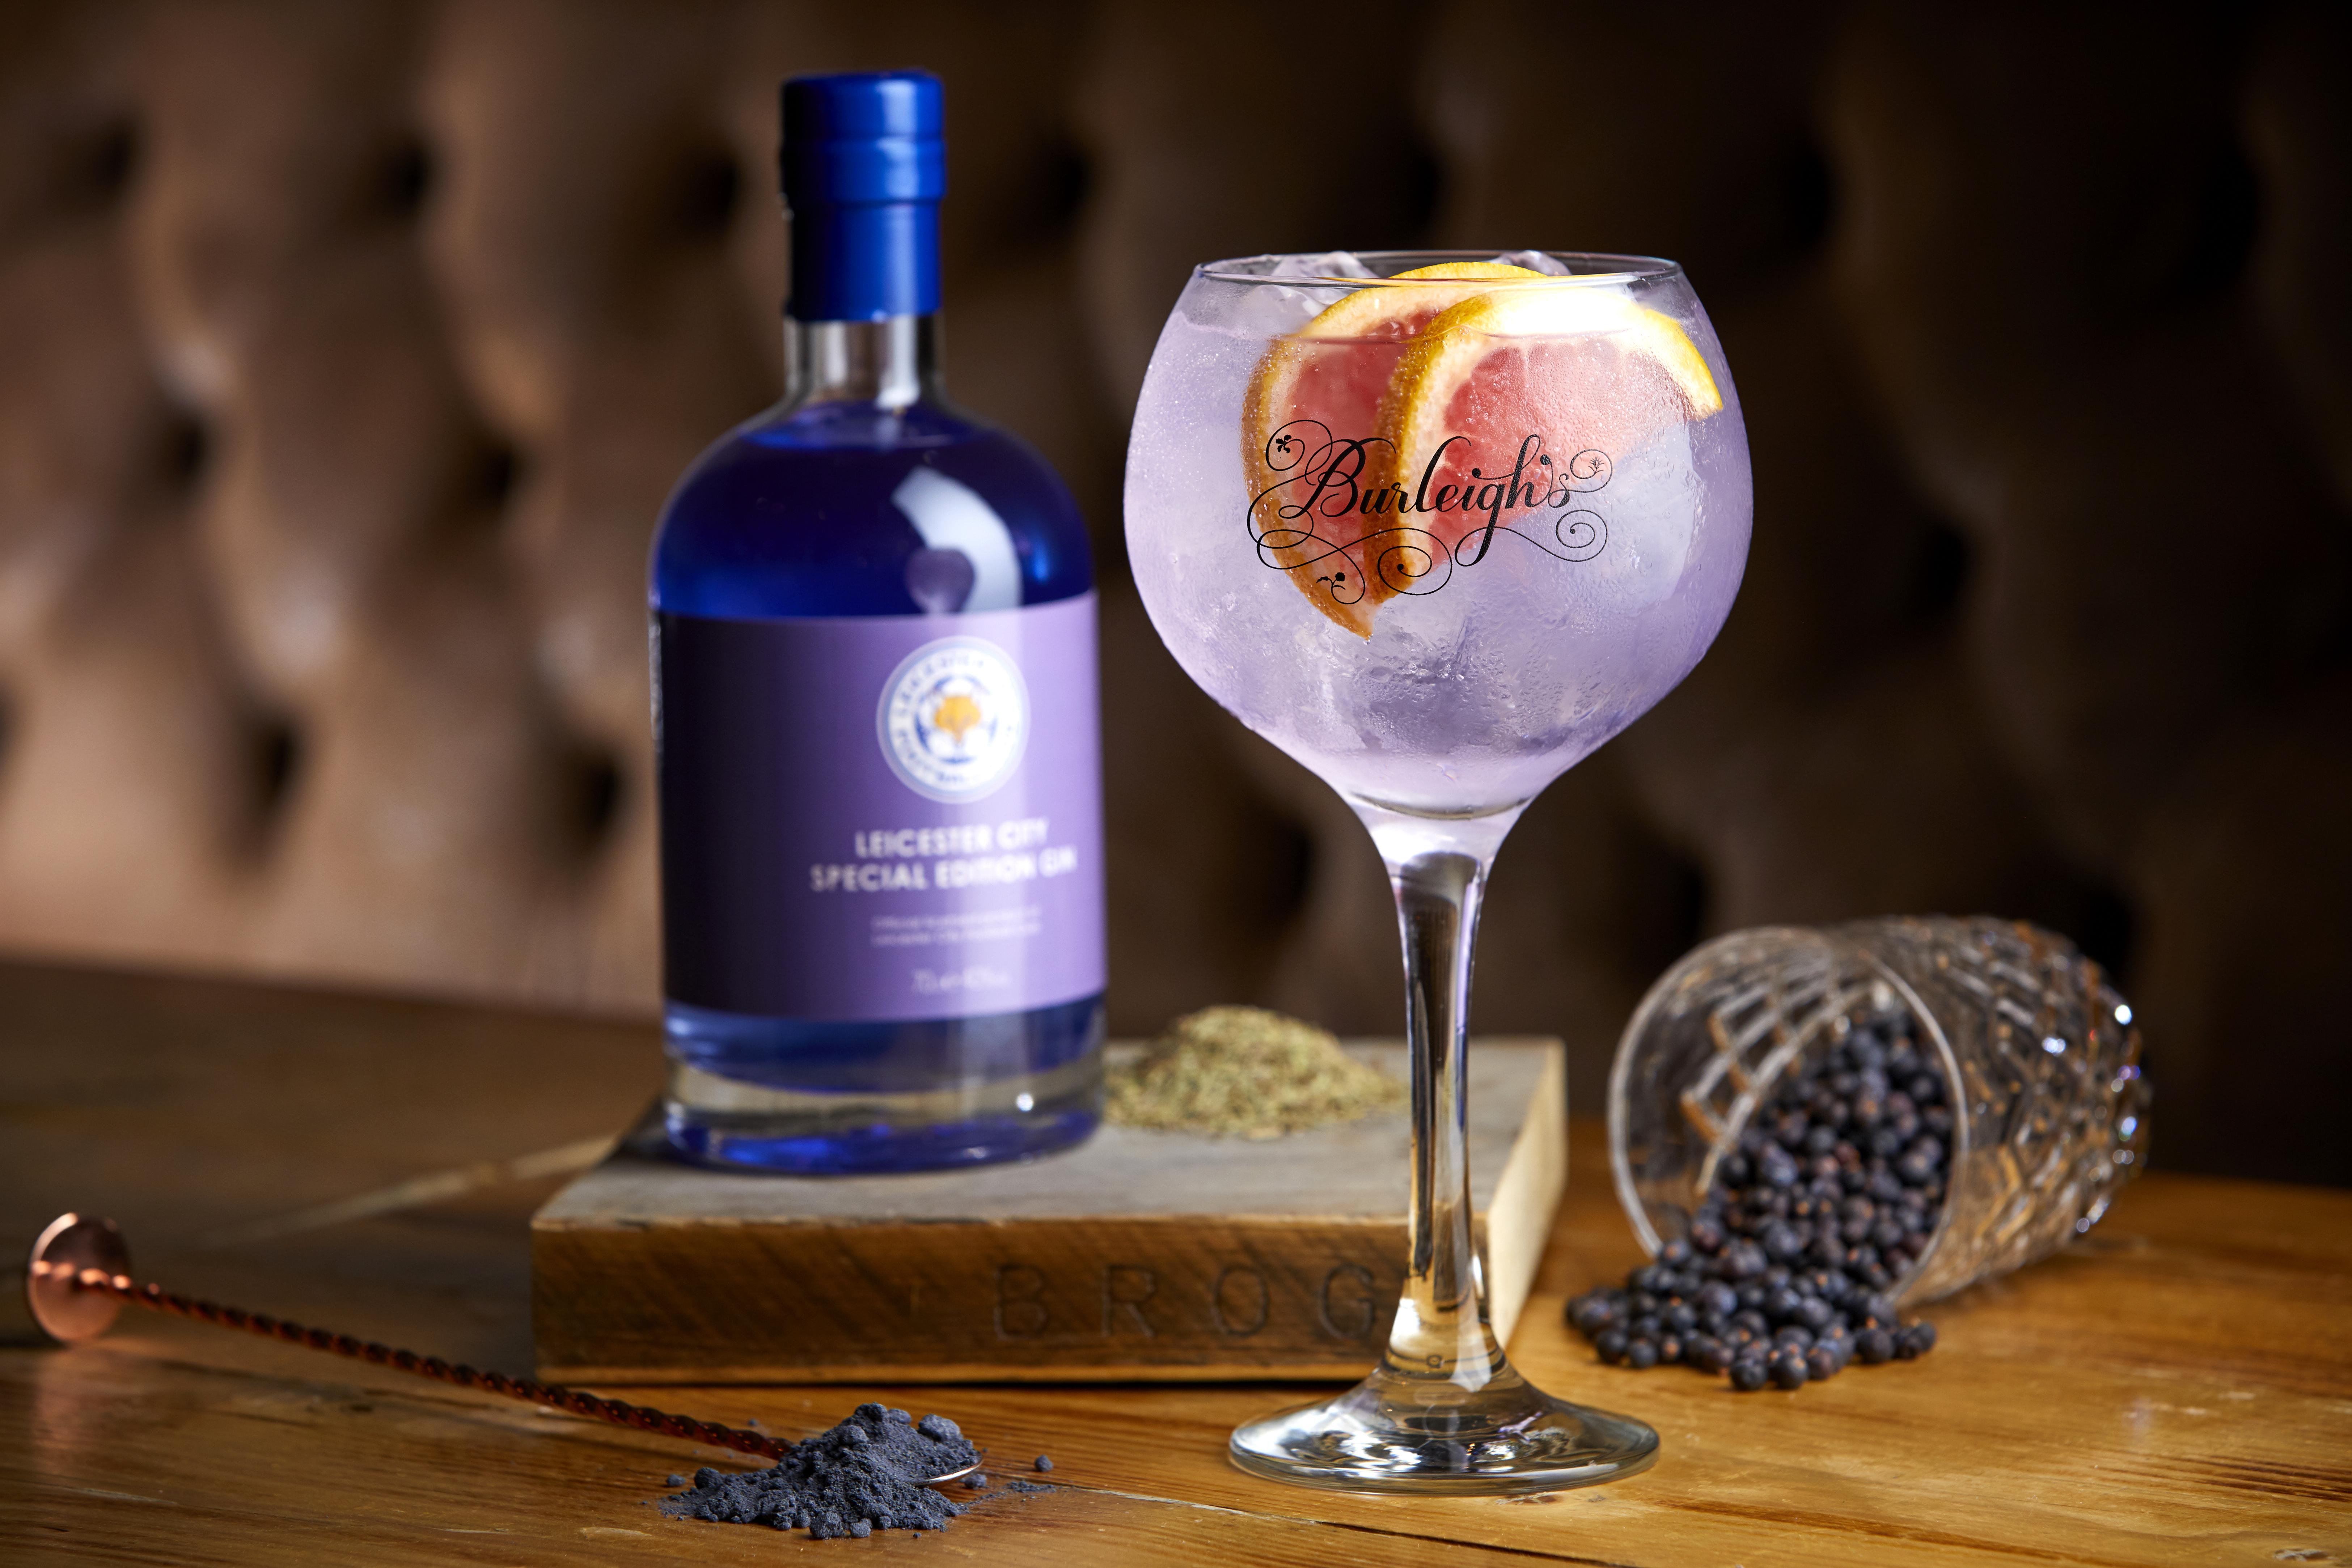 lcfc burleighs gin